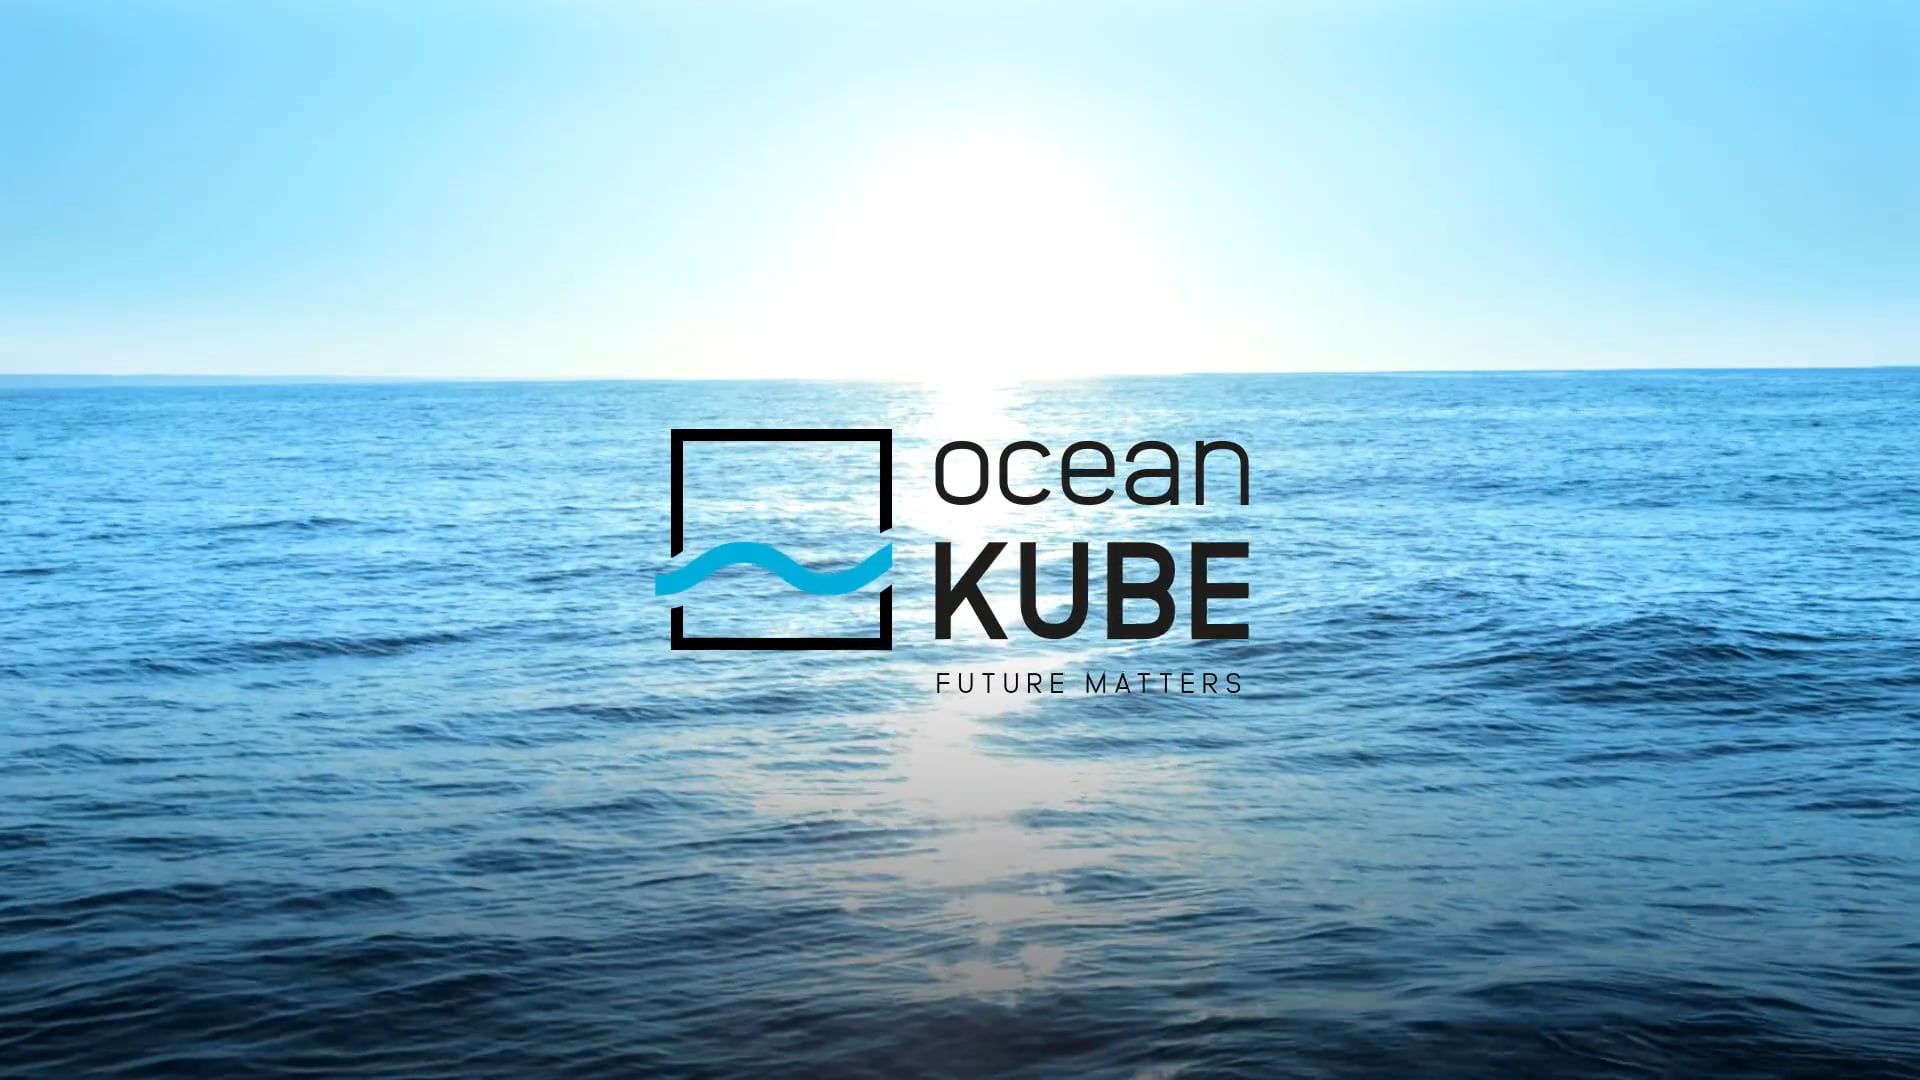 OCEAN KUBE